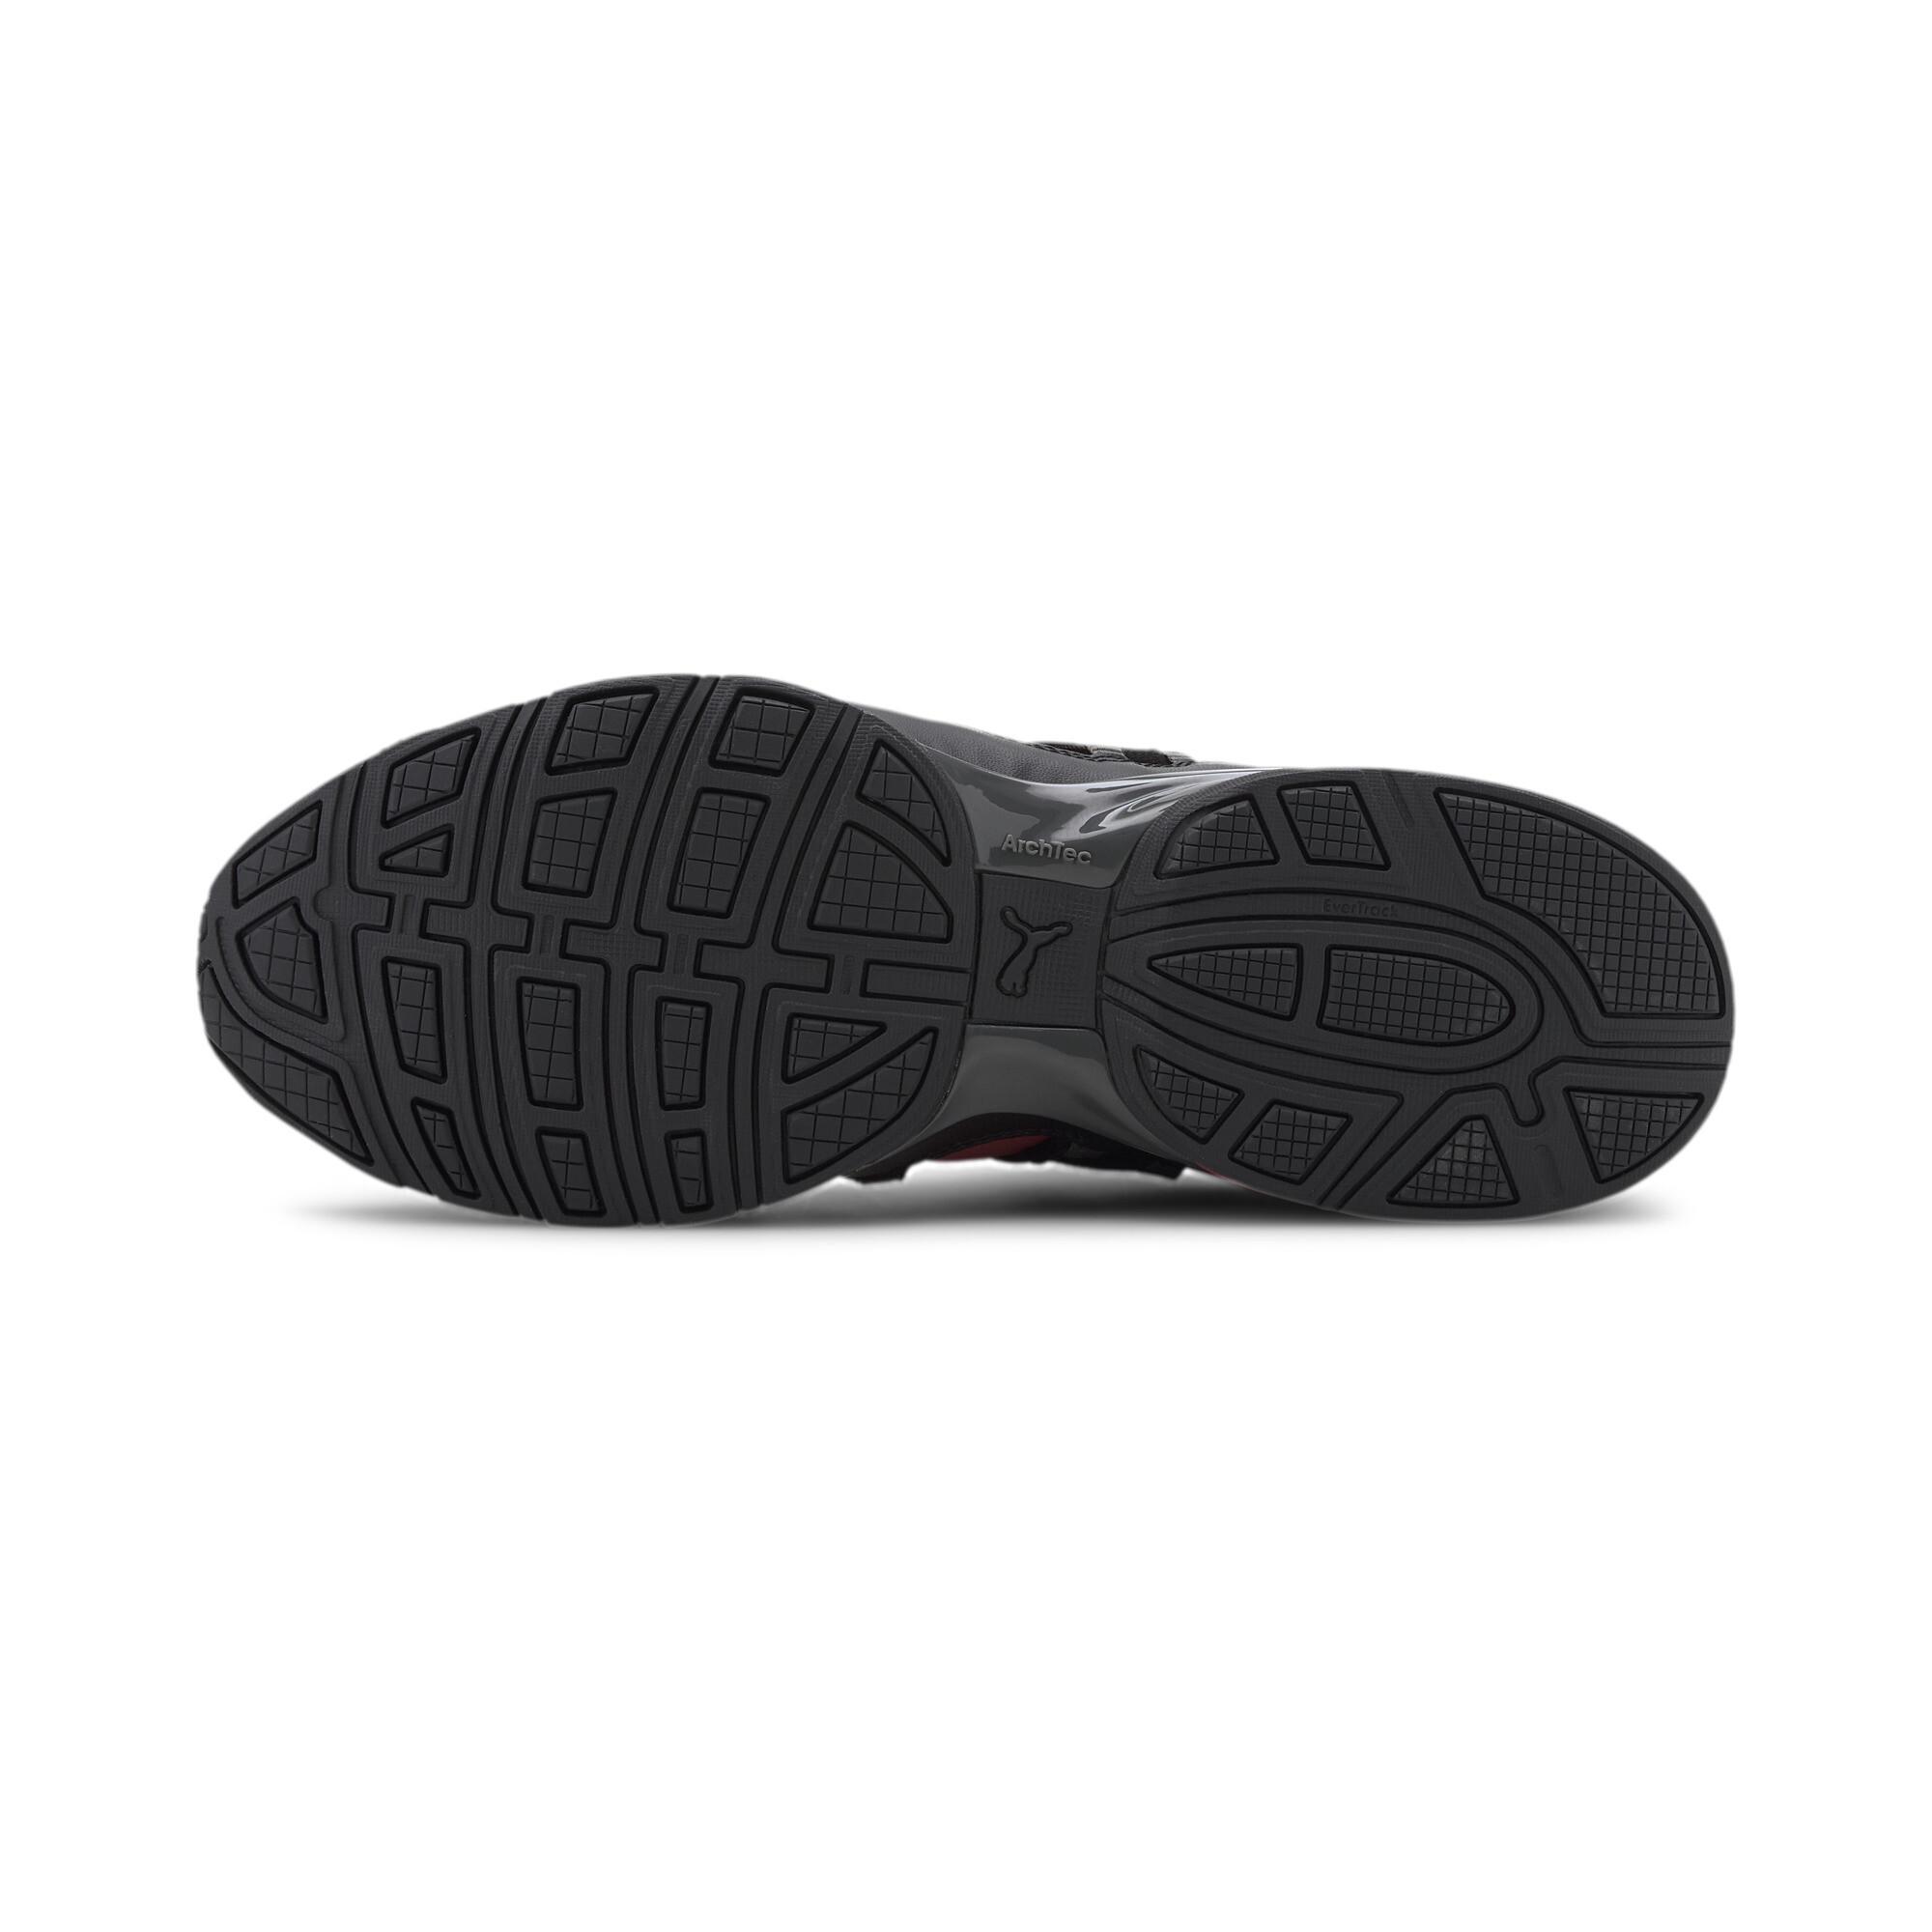 PUMA-Men-039-s-Silverion-Running-Shoes thumbnail 15